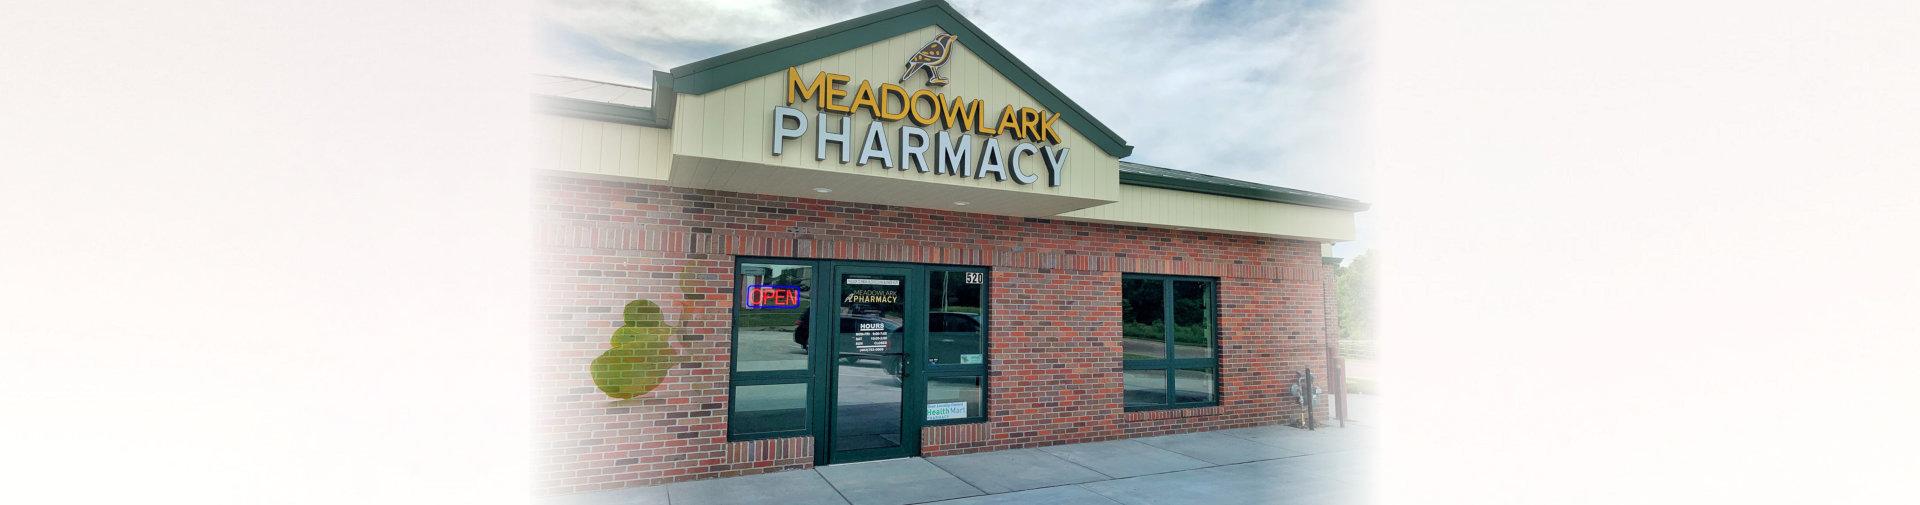 Meadownlark Pharmacy Store